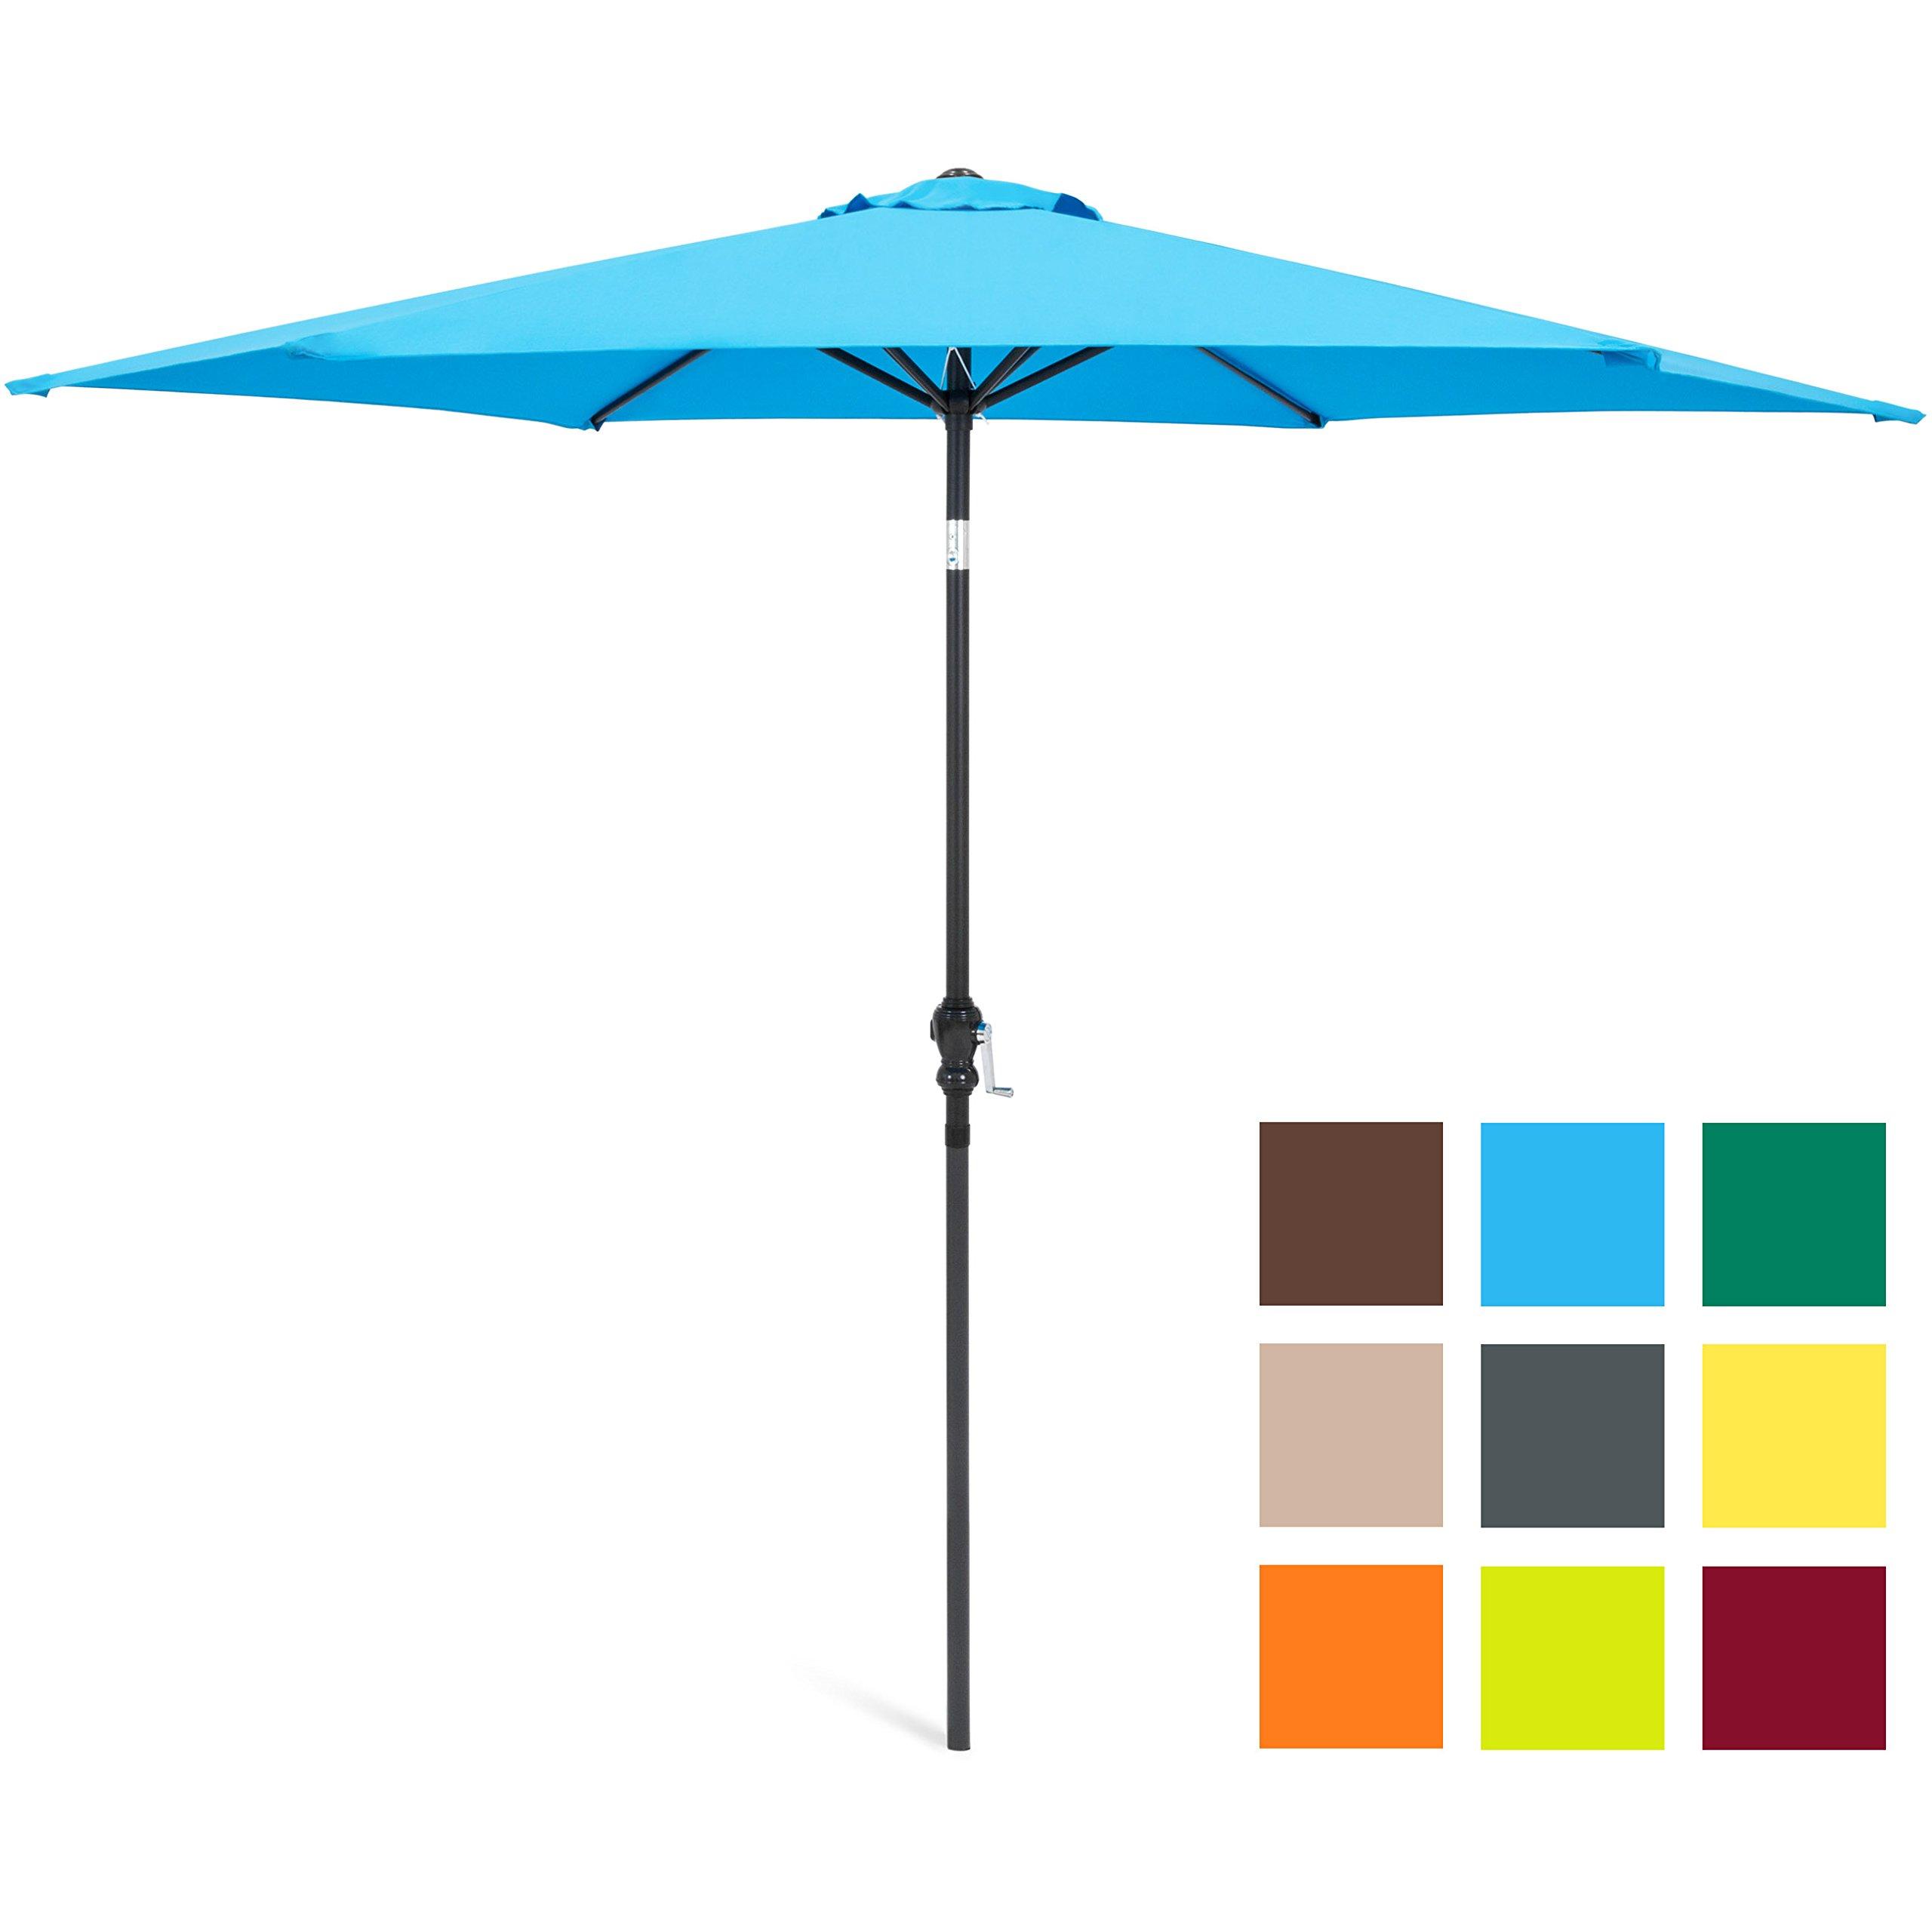 Best Choice Products 10ft Outdoor Steel Market Backyard Garden Patio Umbrella w/Crank, Easy Push Button Tilt, 6 Ribs, Table Compatible - Blue